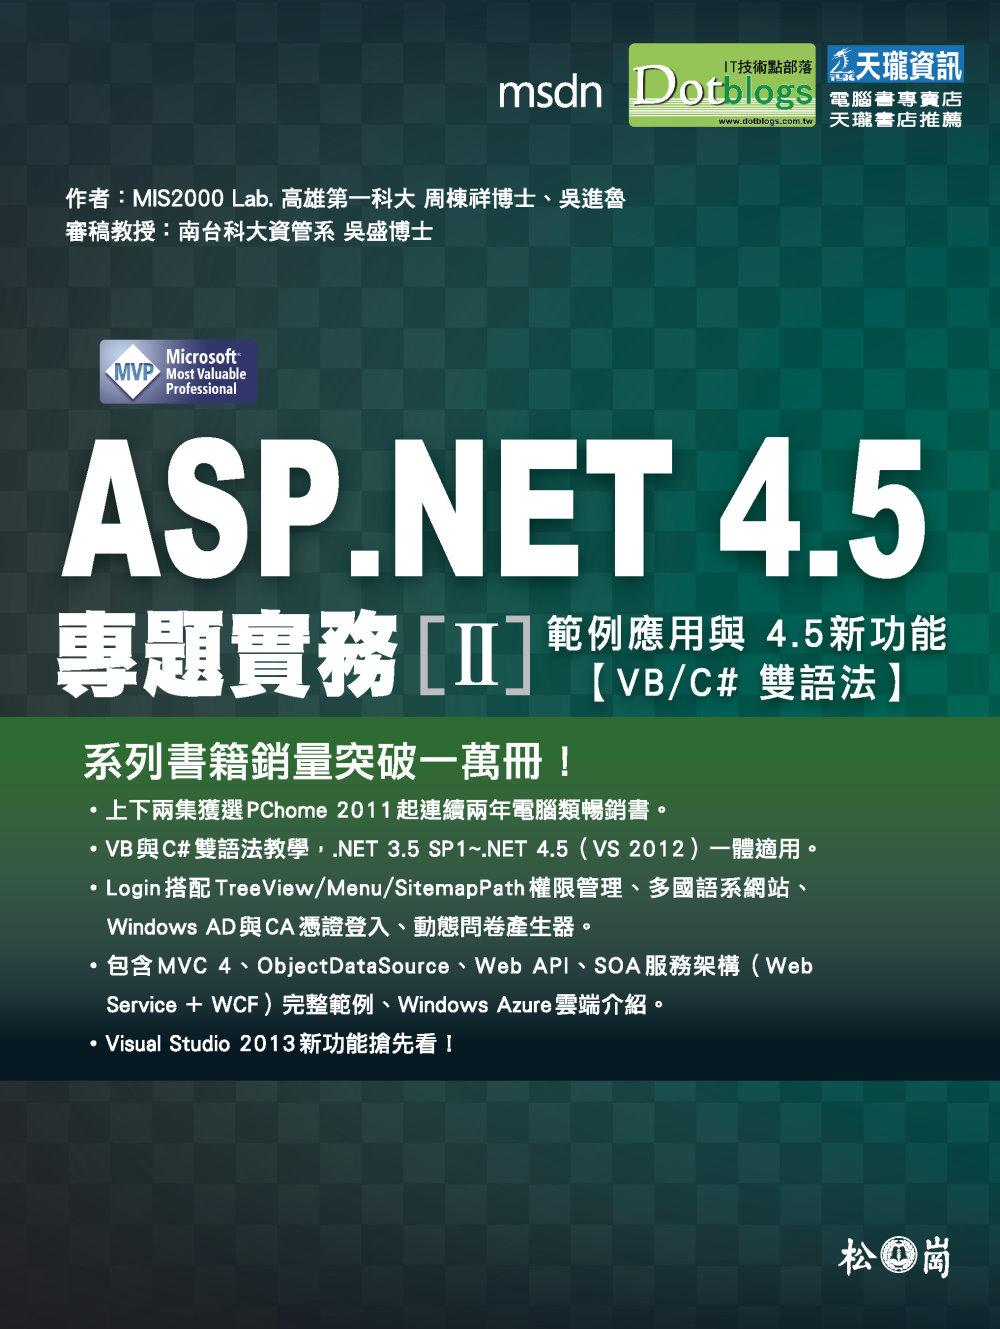 ASP.NET 4.5 專題實務 [II]-範例應用與 4.5 新功能【VB/C# 雙語法】 | 天瓏網路書店